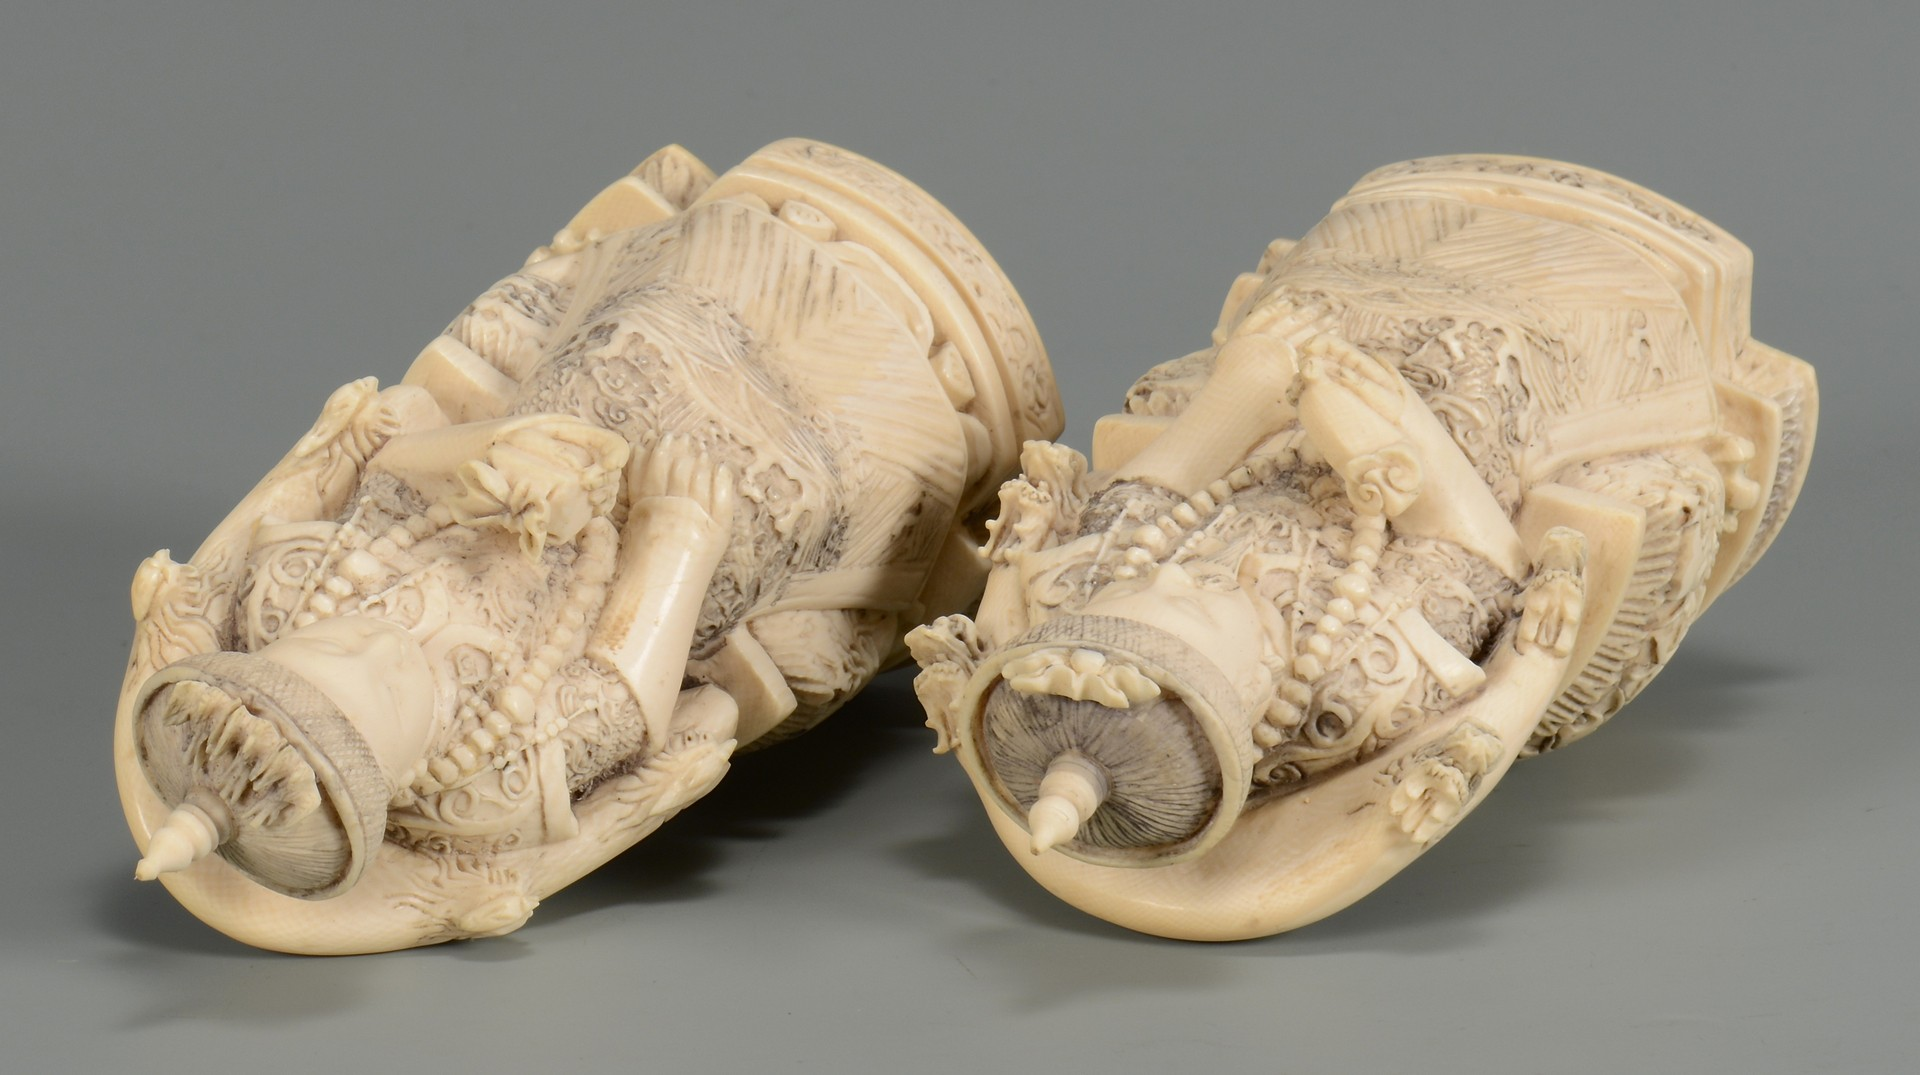 Lot 21: Pr. Chinese Carved Ivory Figures, Emperor & Empress